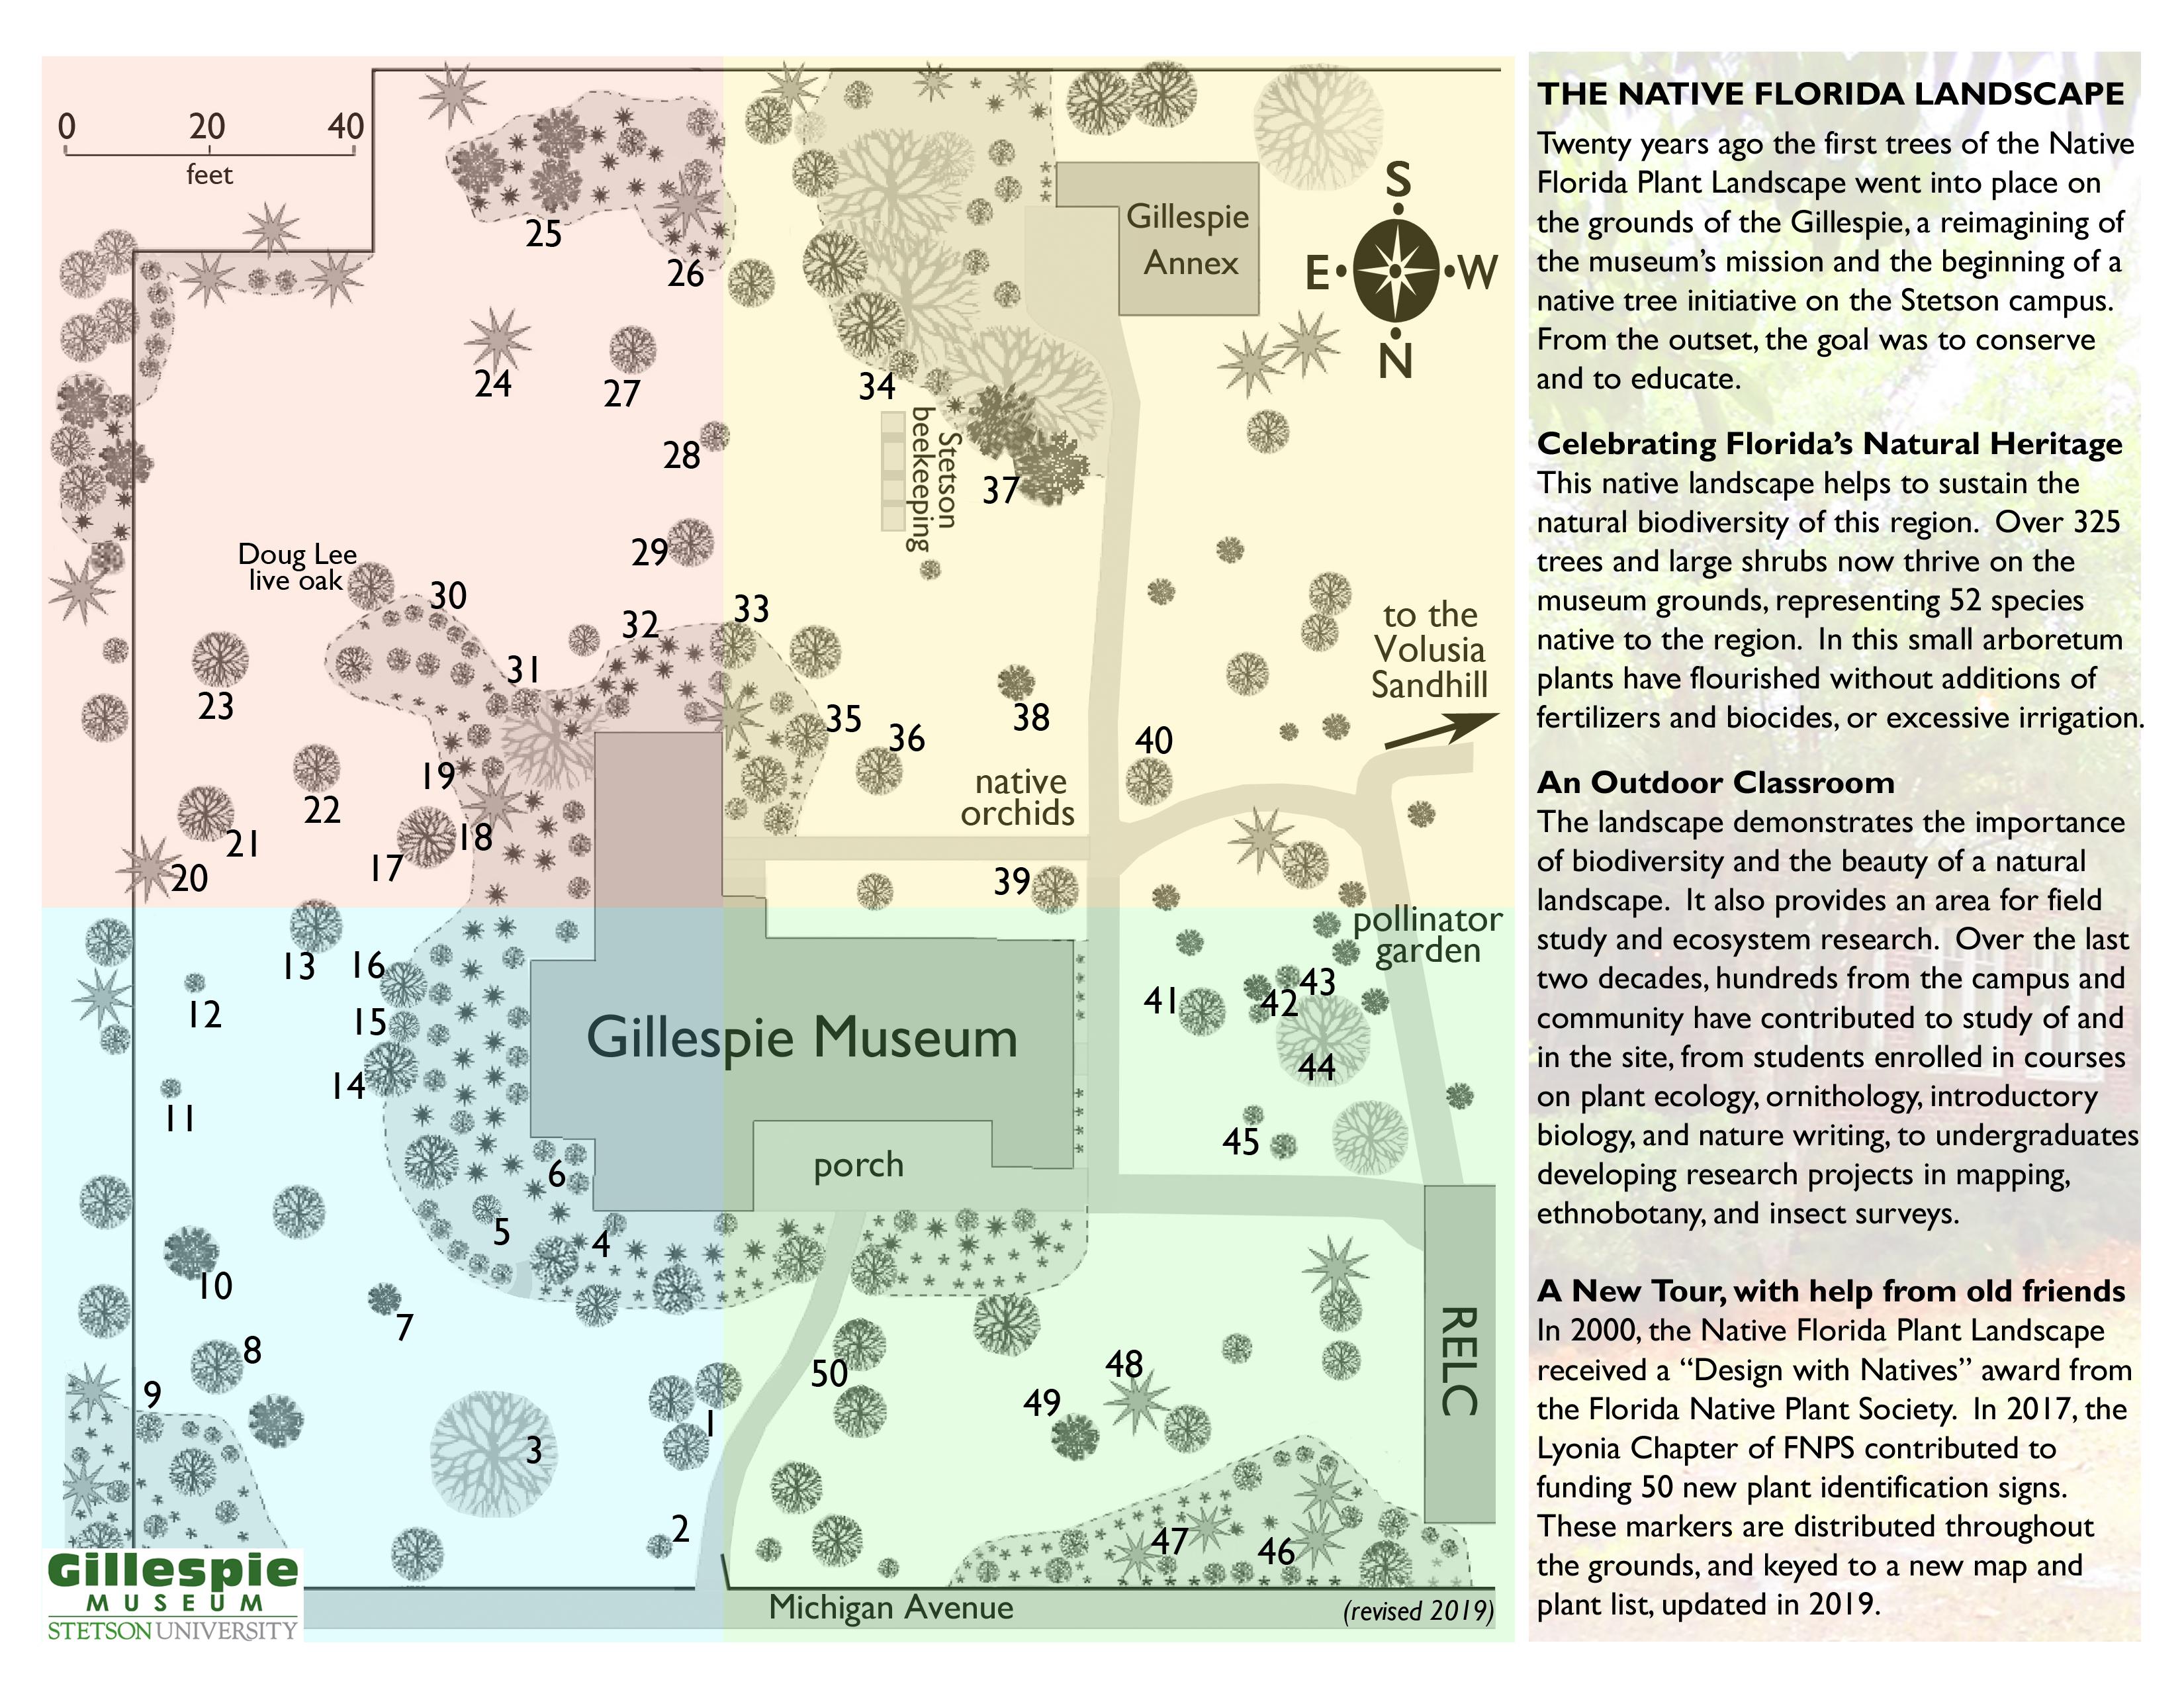 media/native-landscape-map-only.jpg